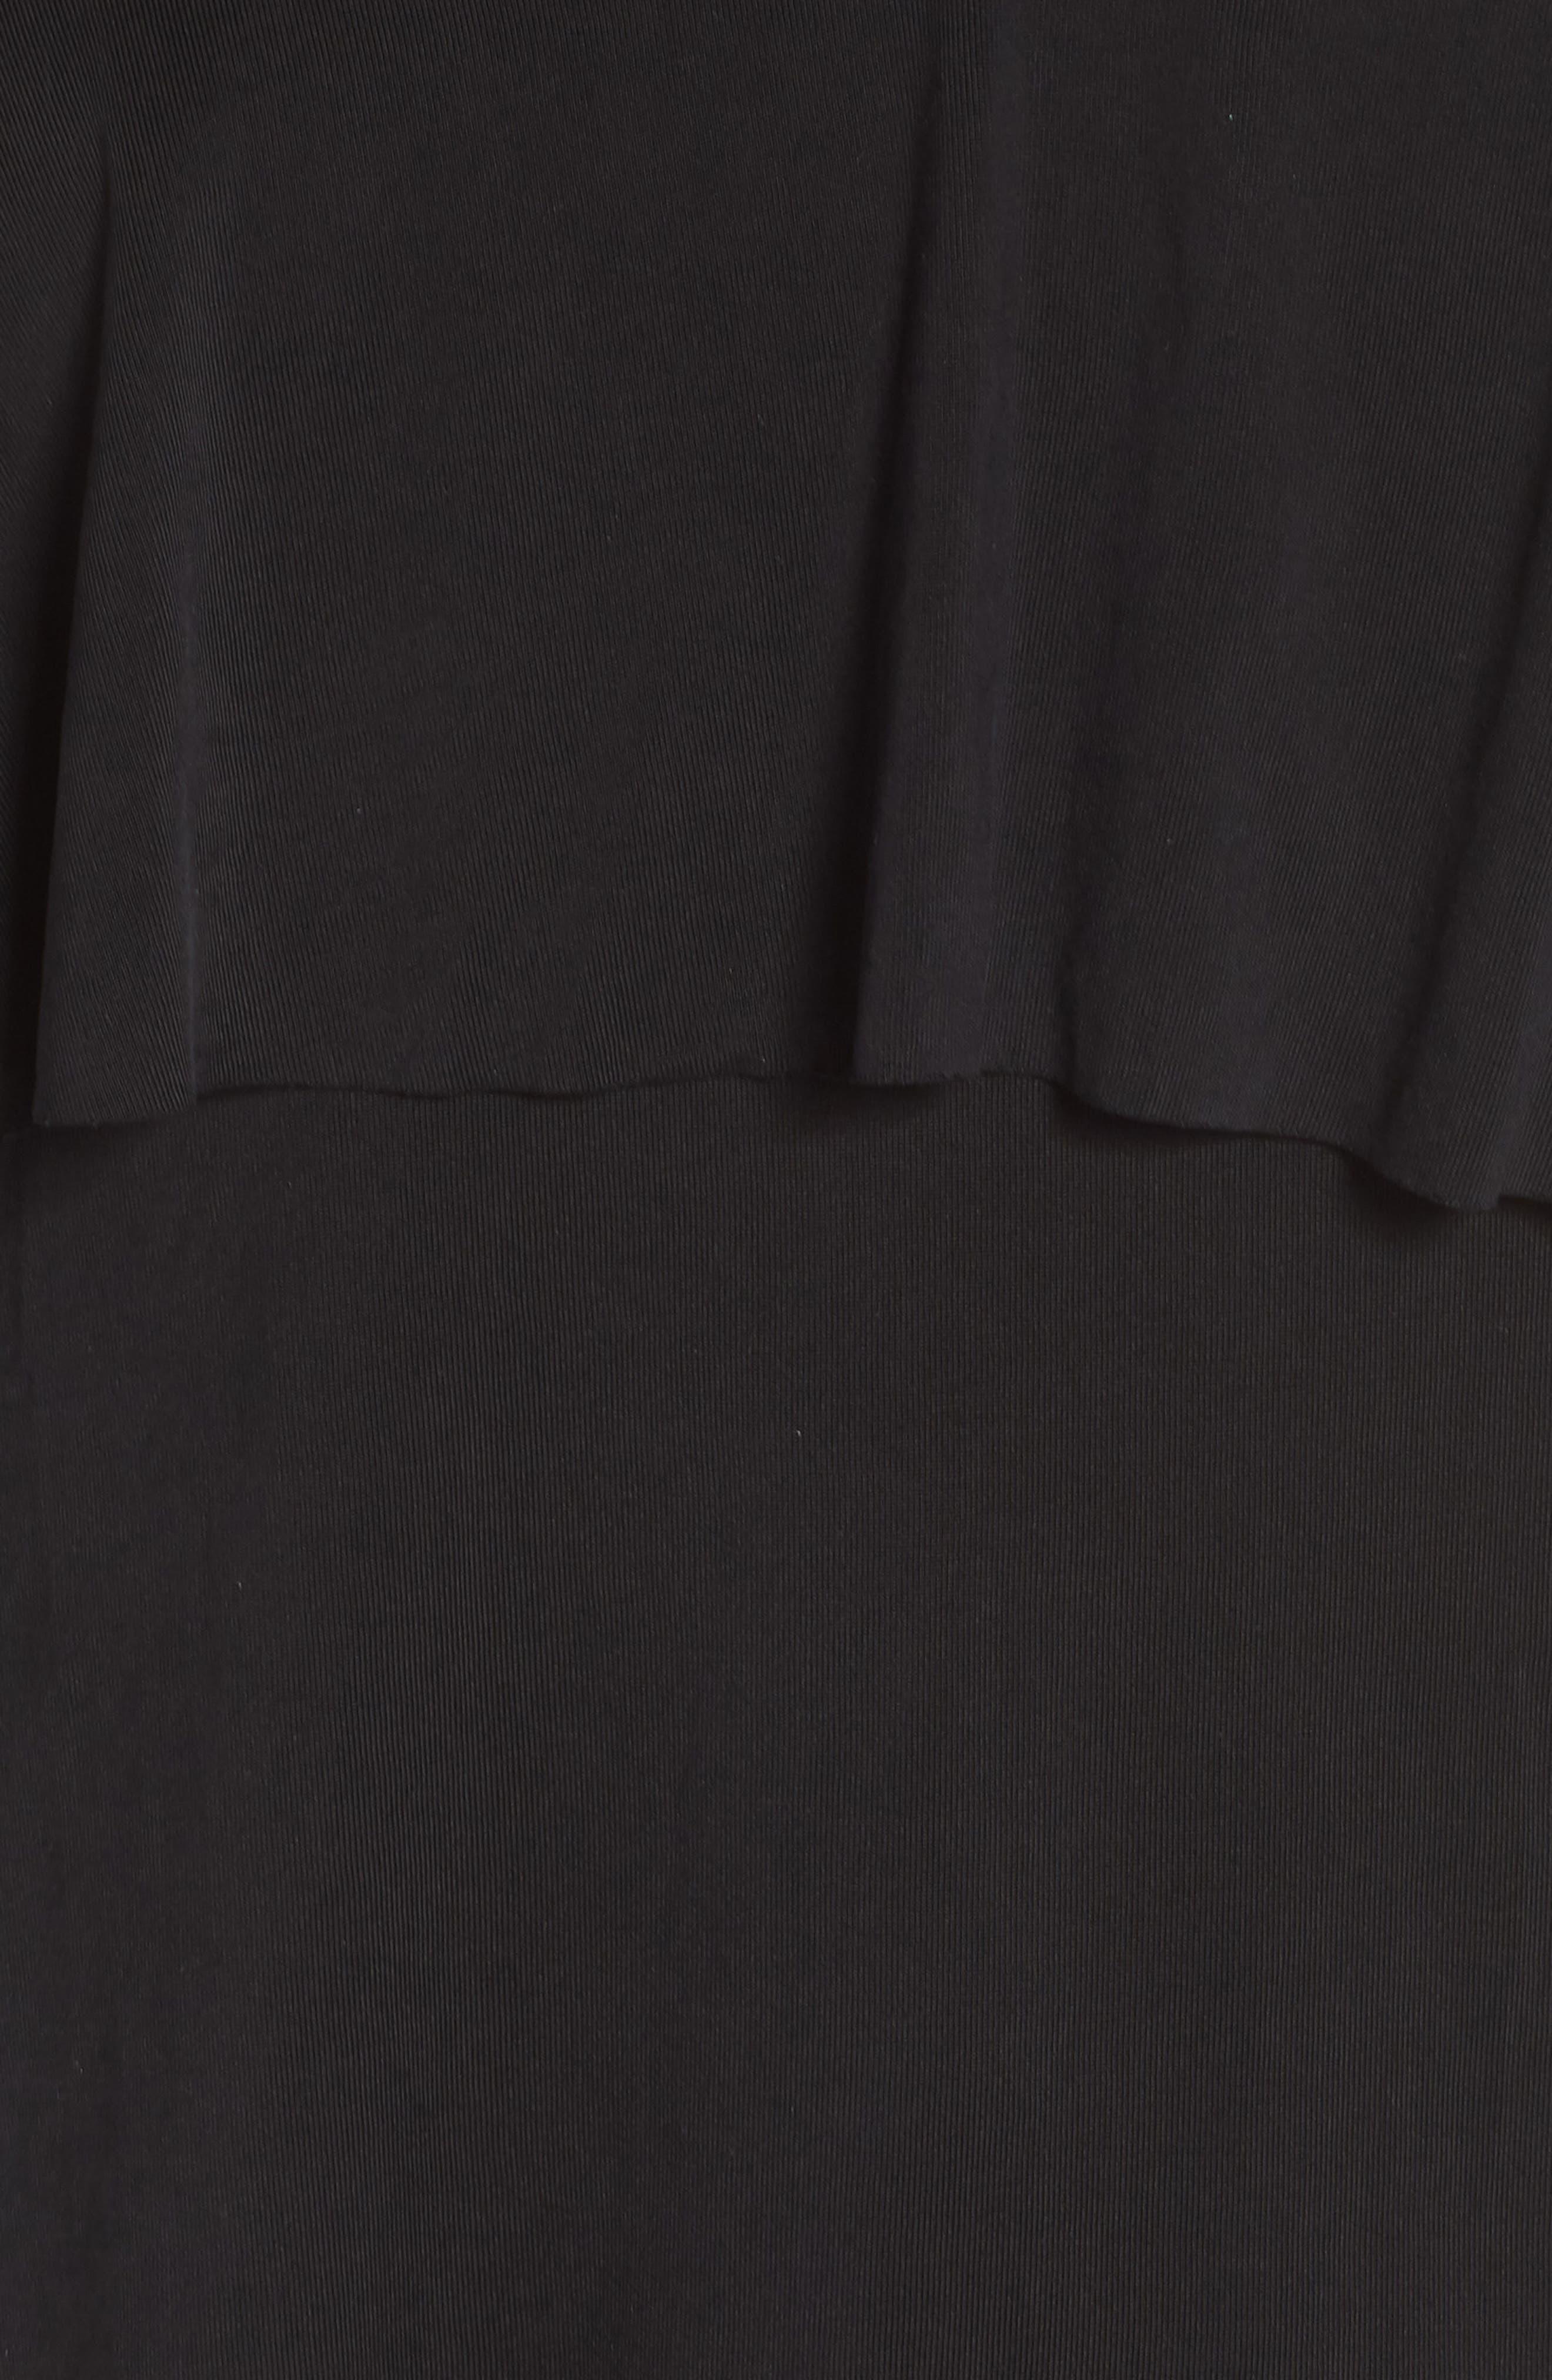 North Sleeveless Ruffle Top,                             Alternate thumbnail 5, color,                             BLACK